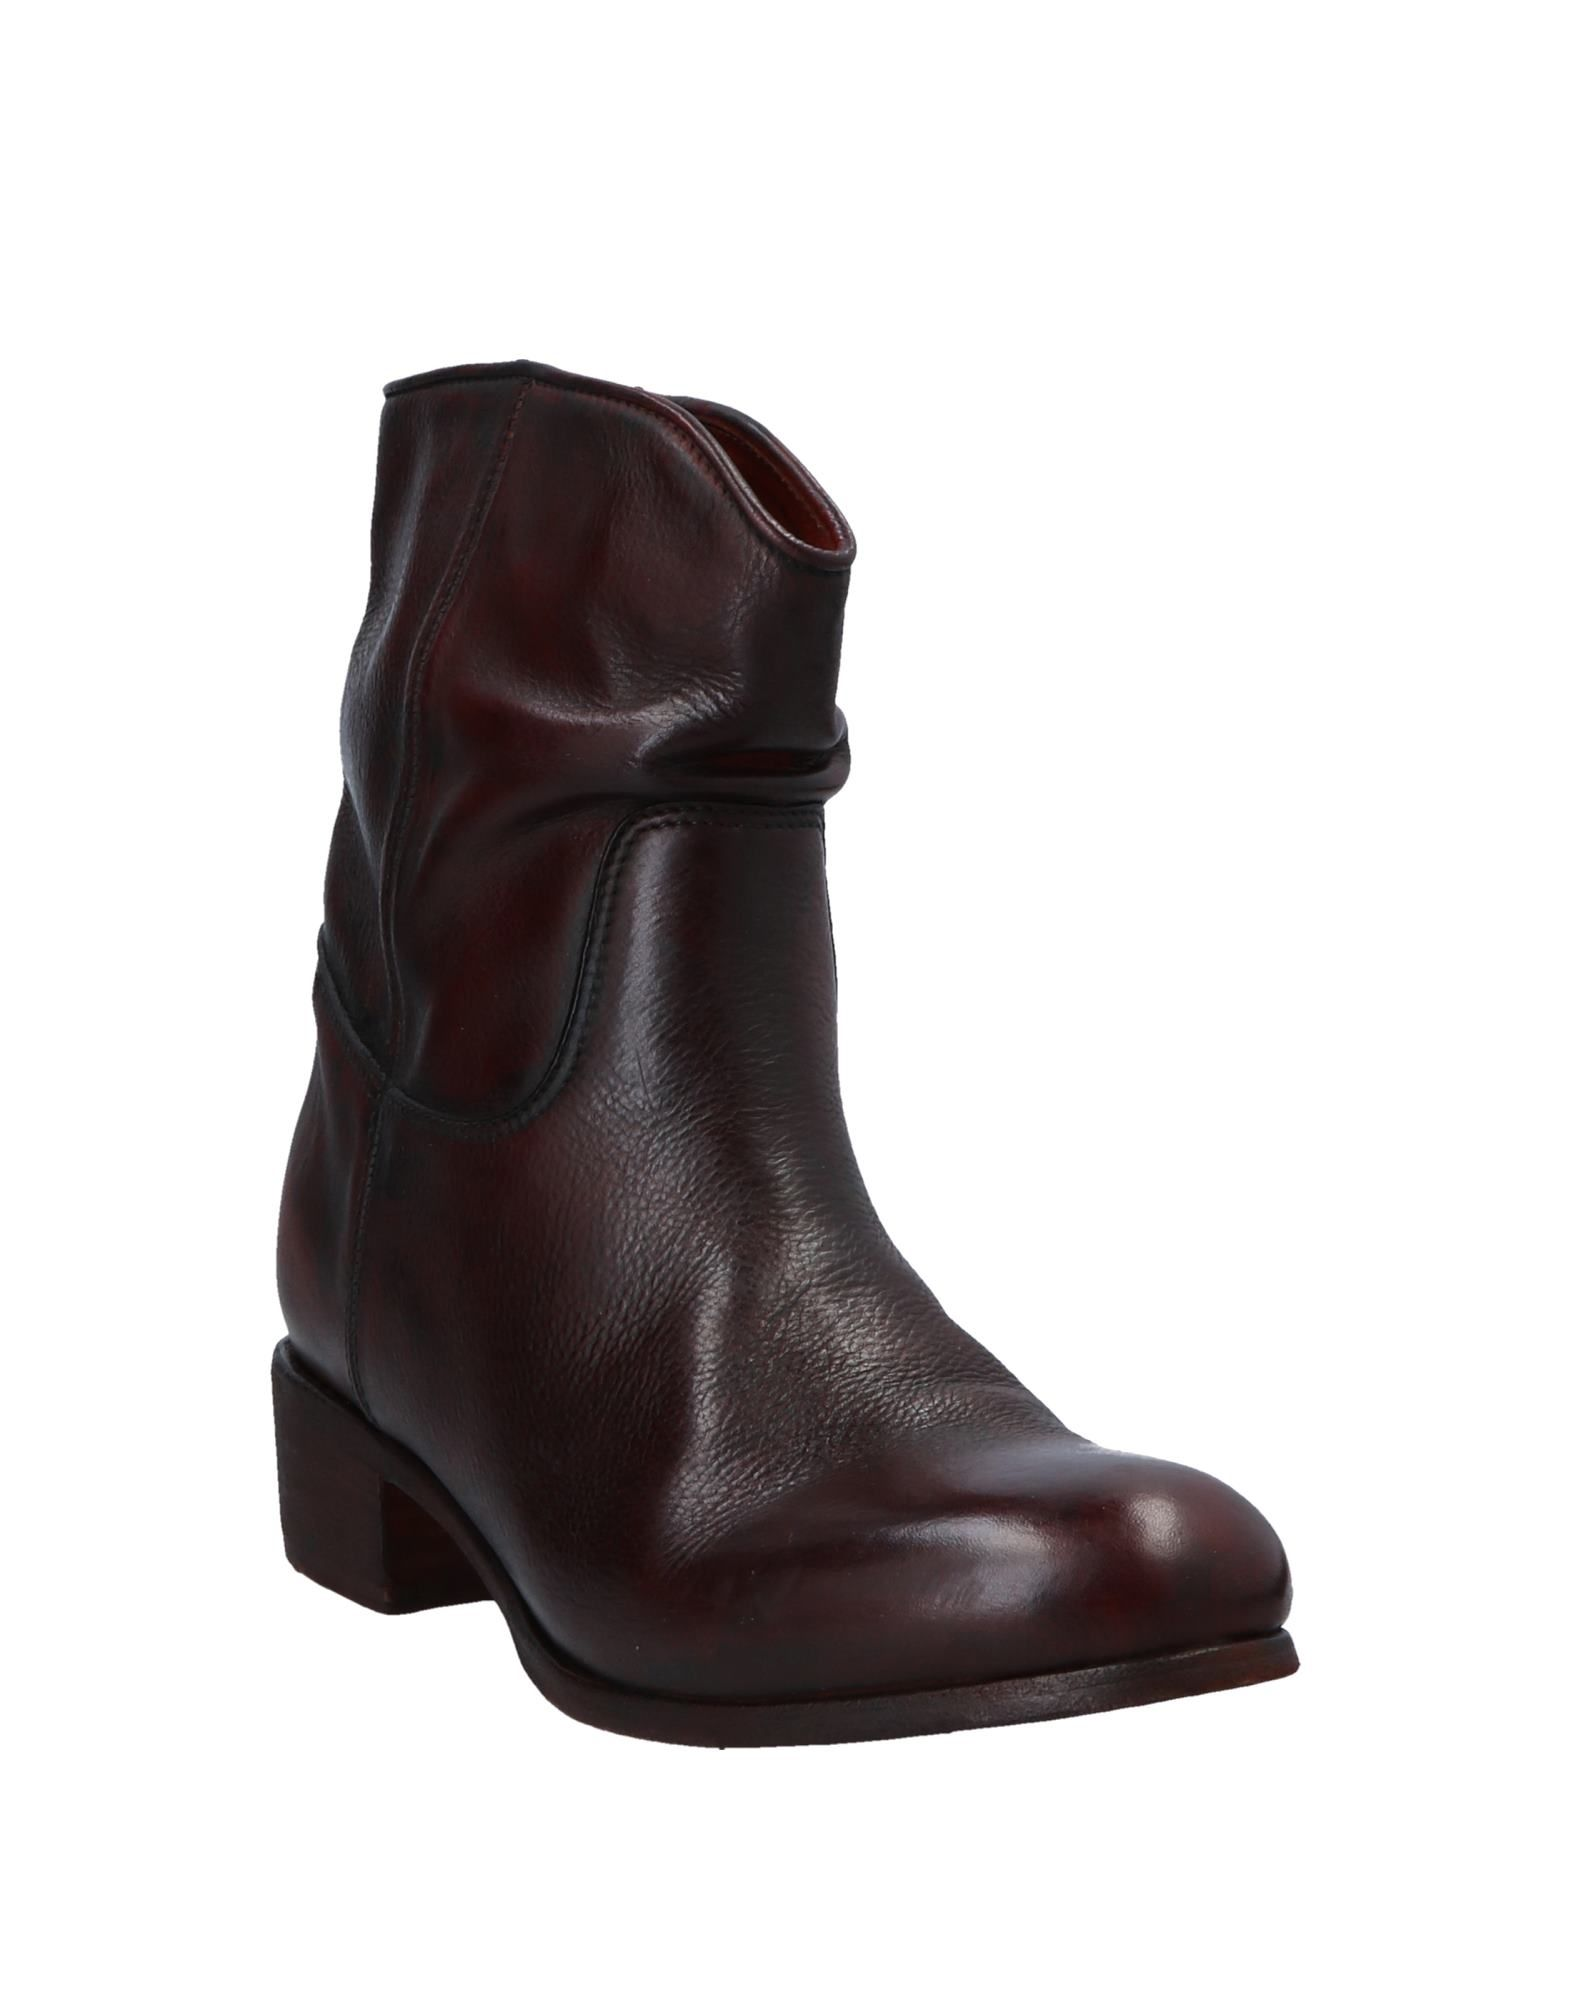 El Campero Stiefelette Damen  11545588AEGut aussehende aussehende aussehende strapazierfähige Schuhe b12aa8